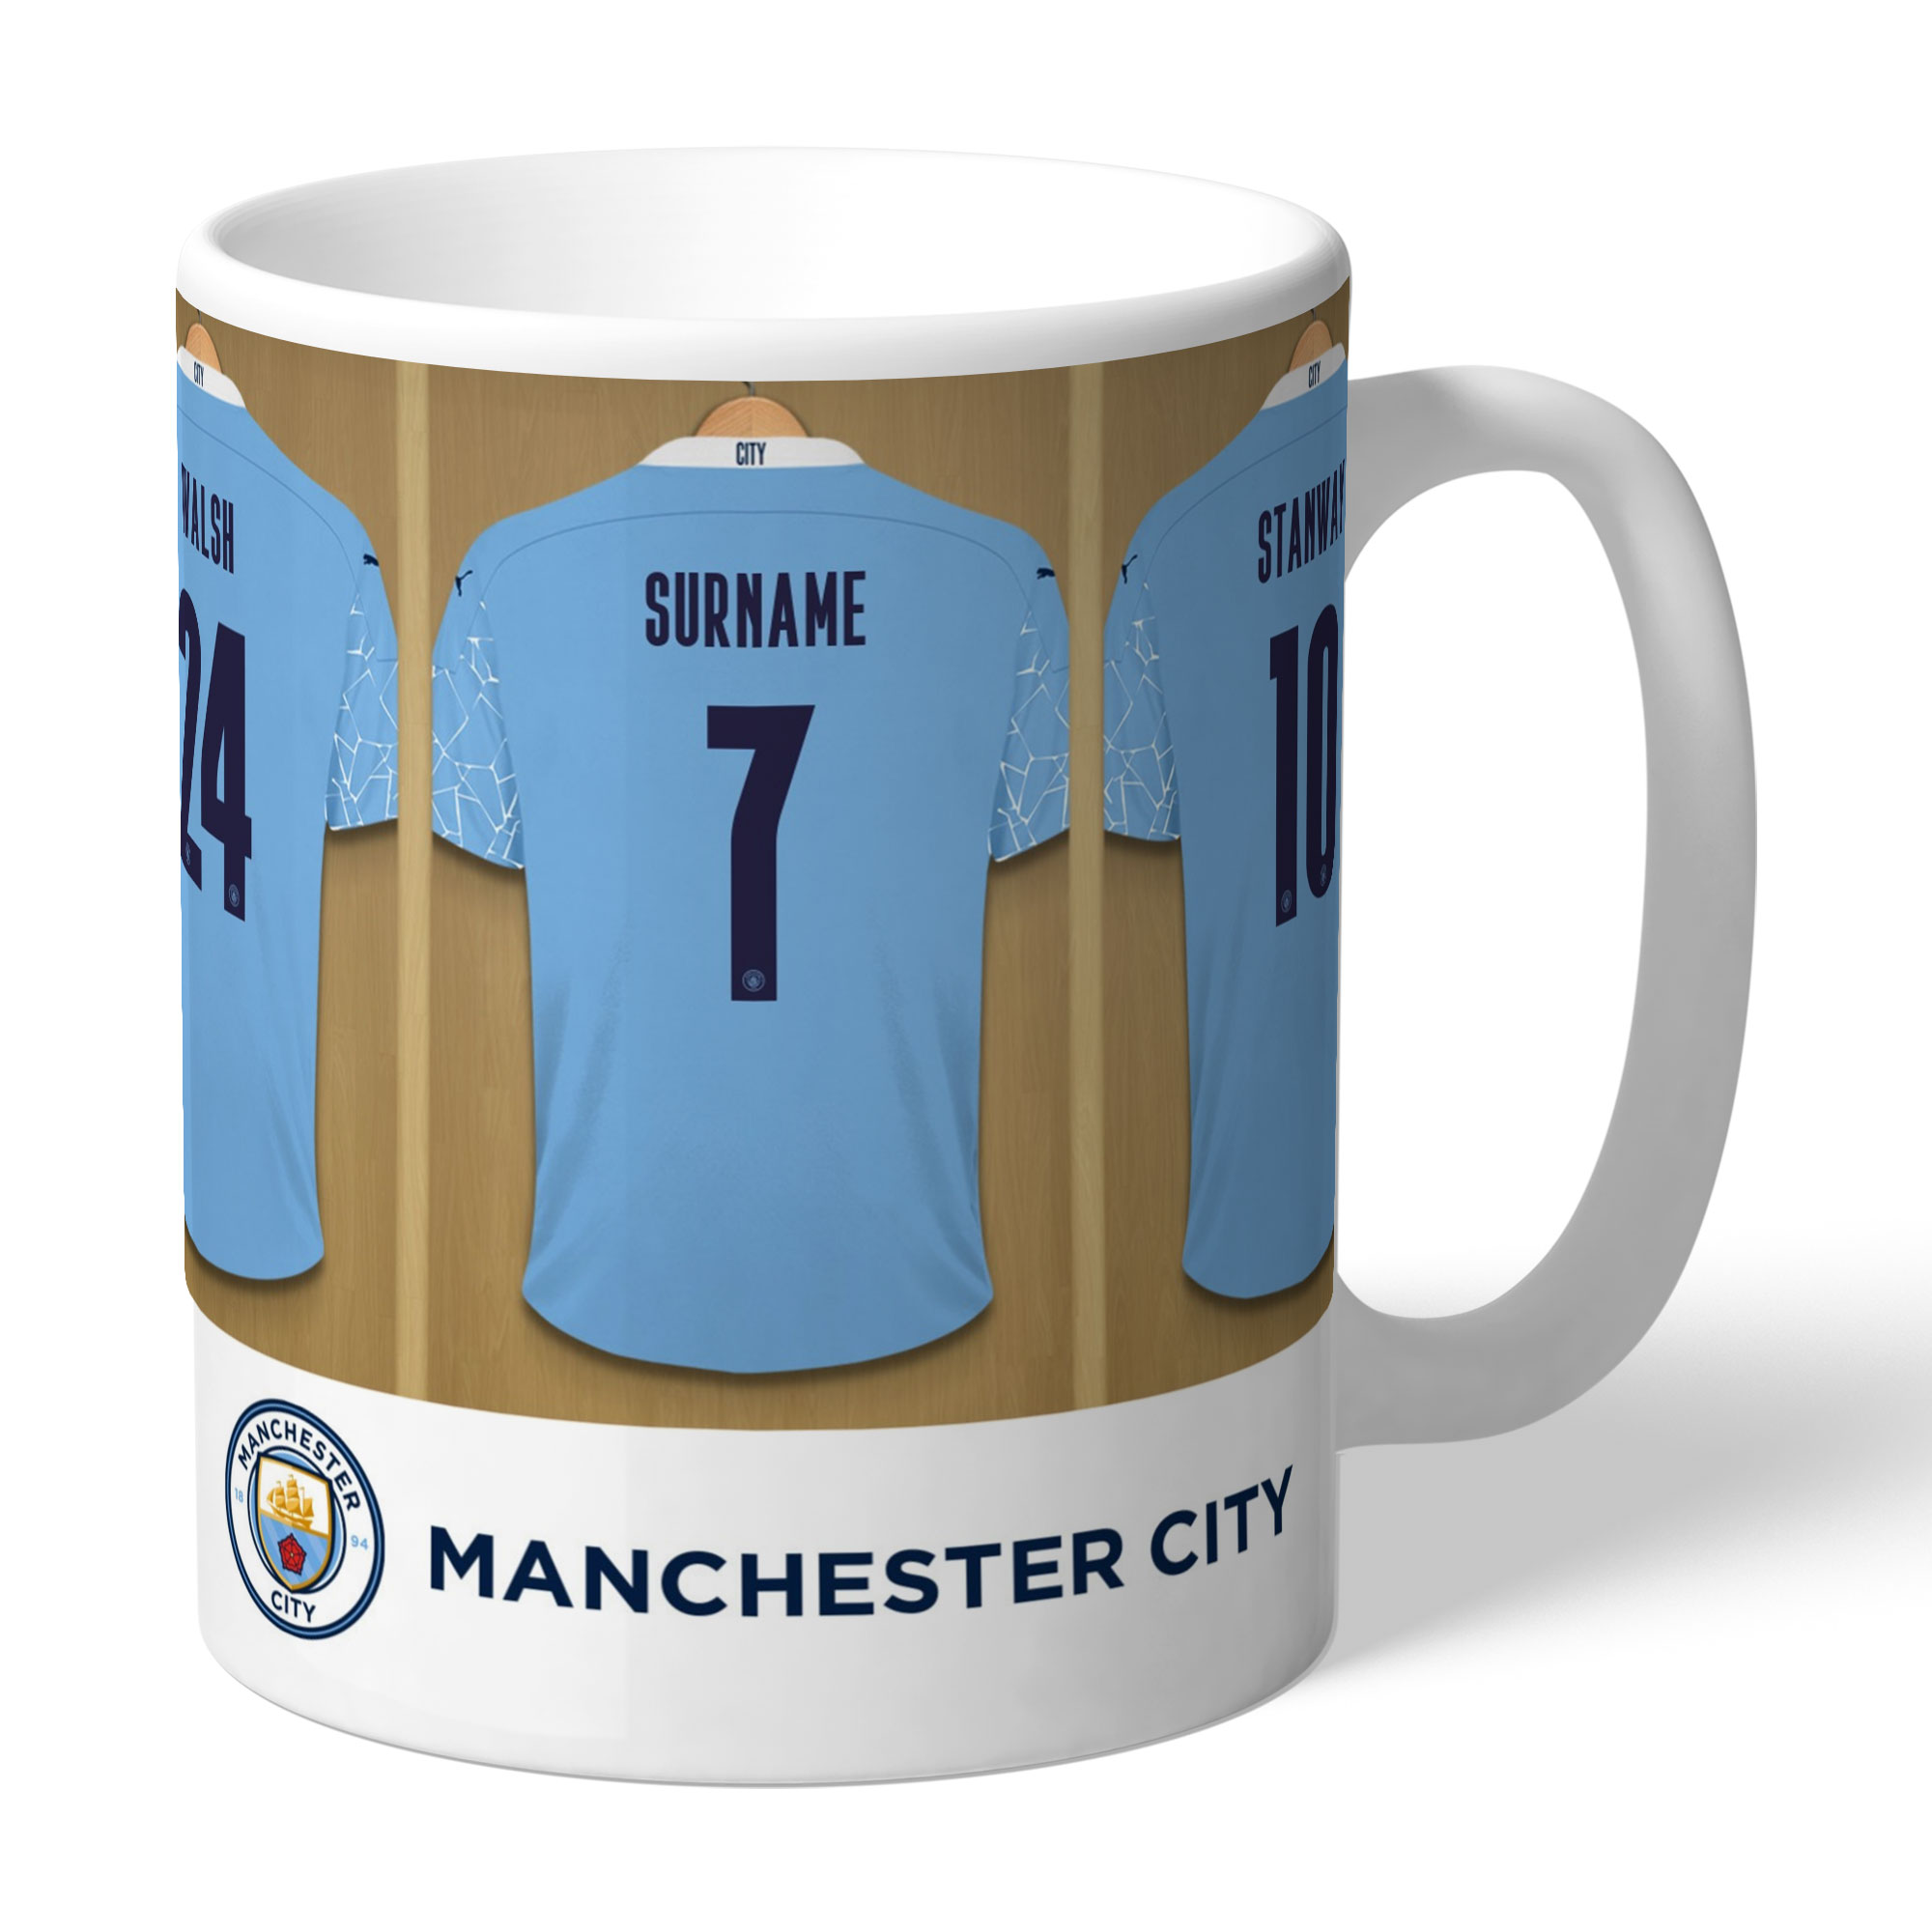 Manchester City FC Women's Team Dressing Room Mug